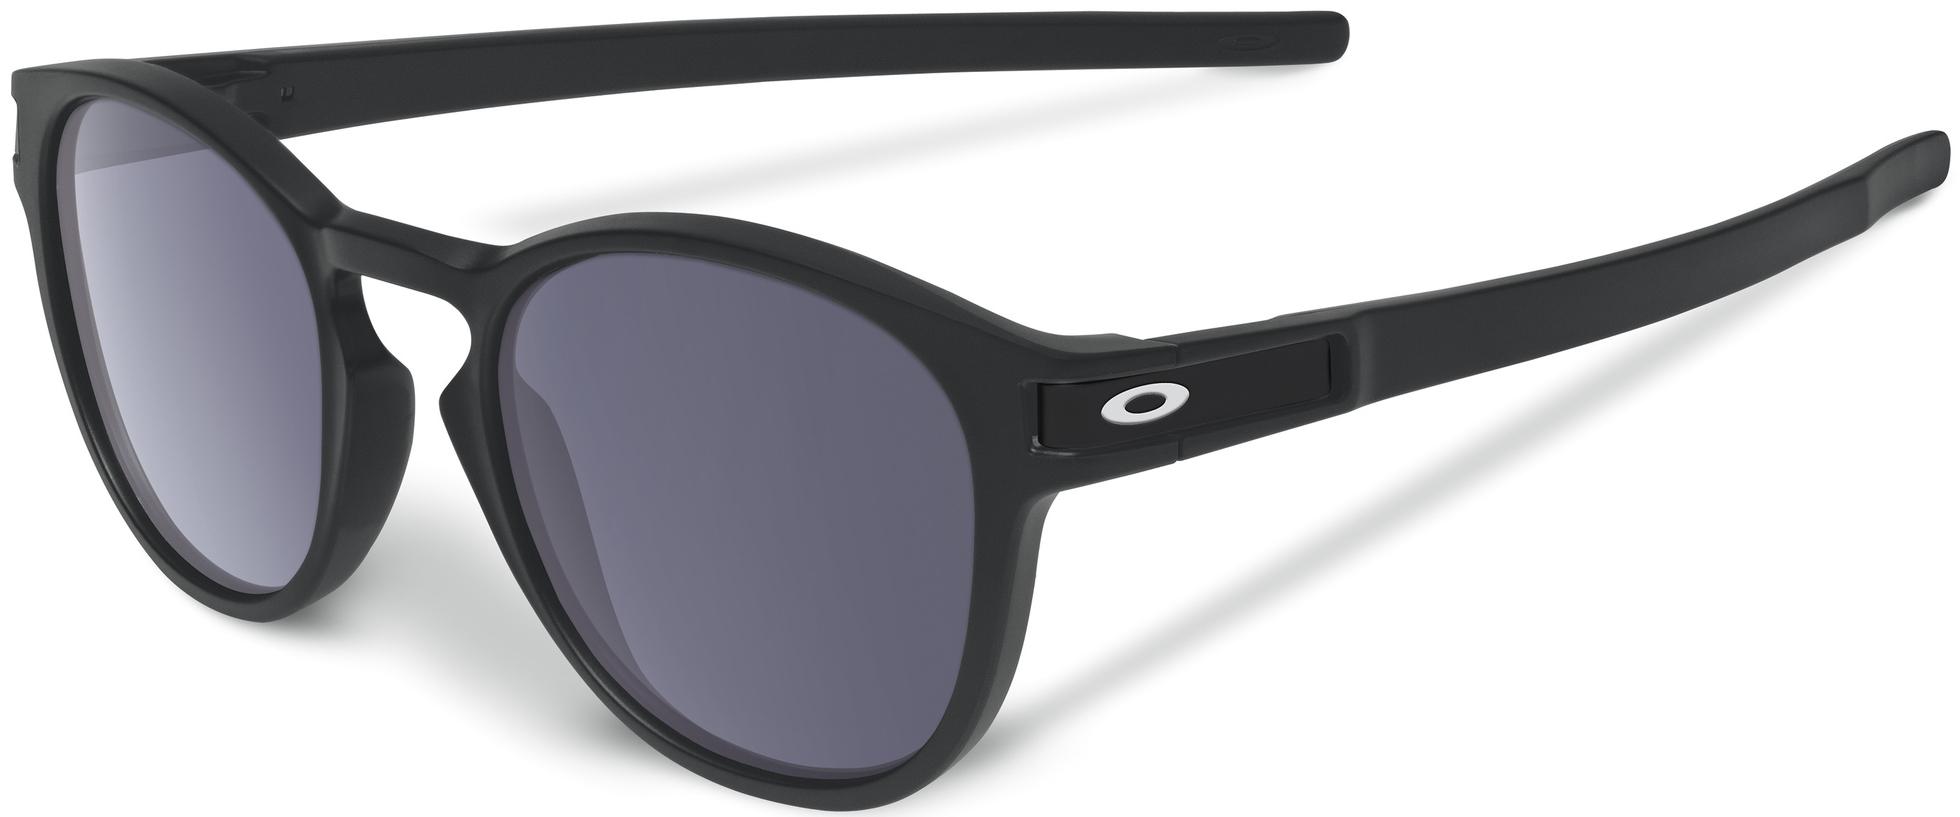 Oakley Latch™ Sunglasses, $130